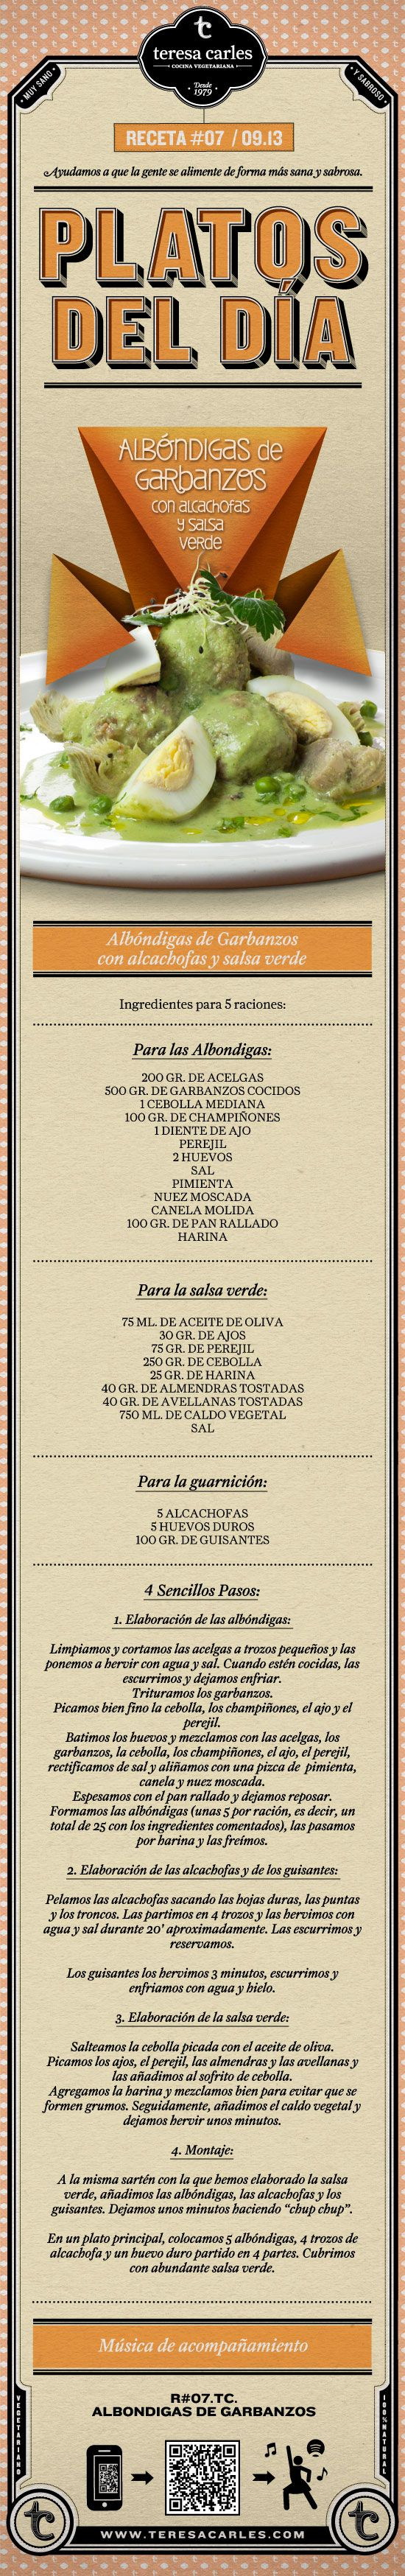 RECETA #07 / 09.13 Albóndigas de Garbanzos con Alcachofas y Salsa Verde. Teresa Carles - www.teresacarles.com